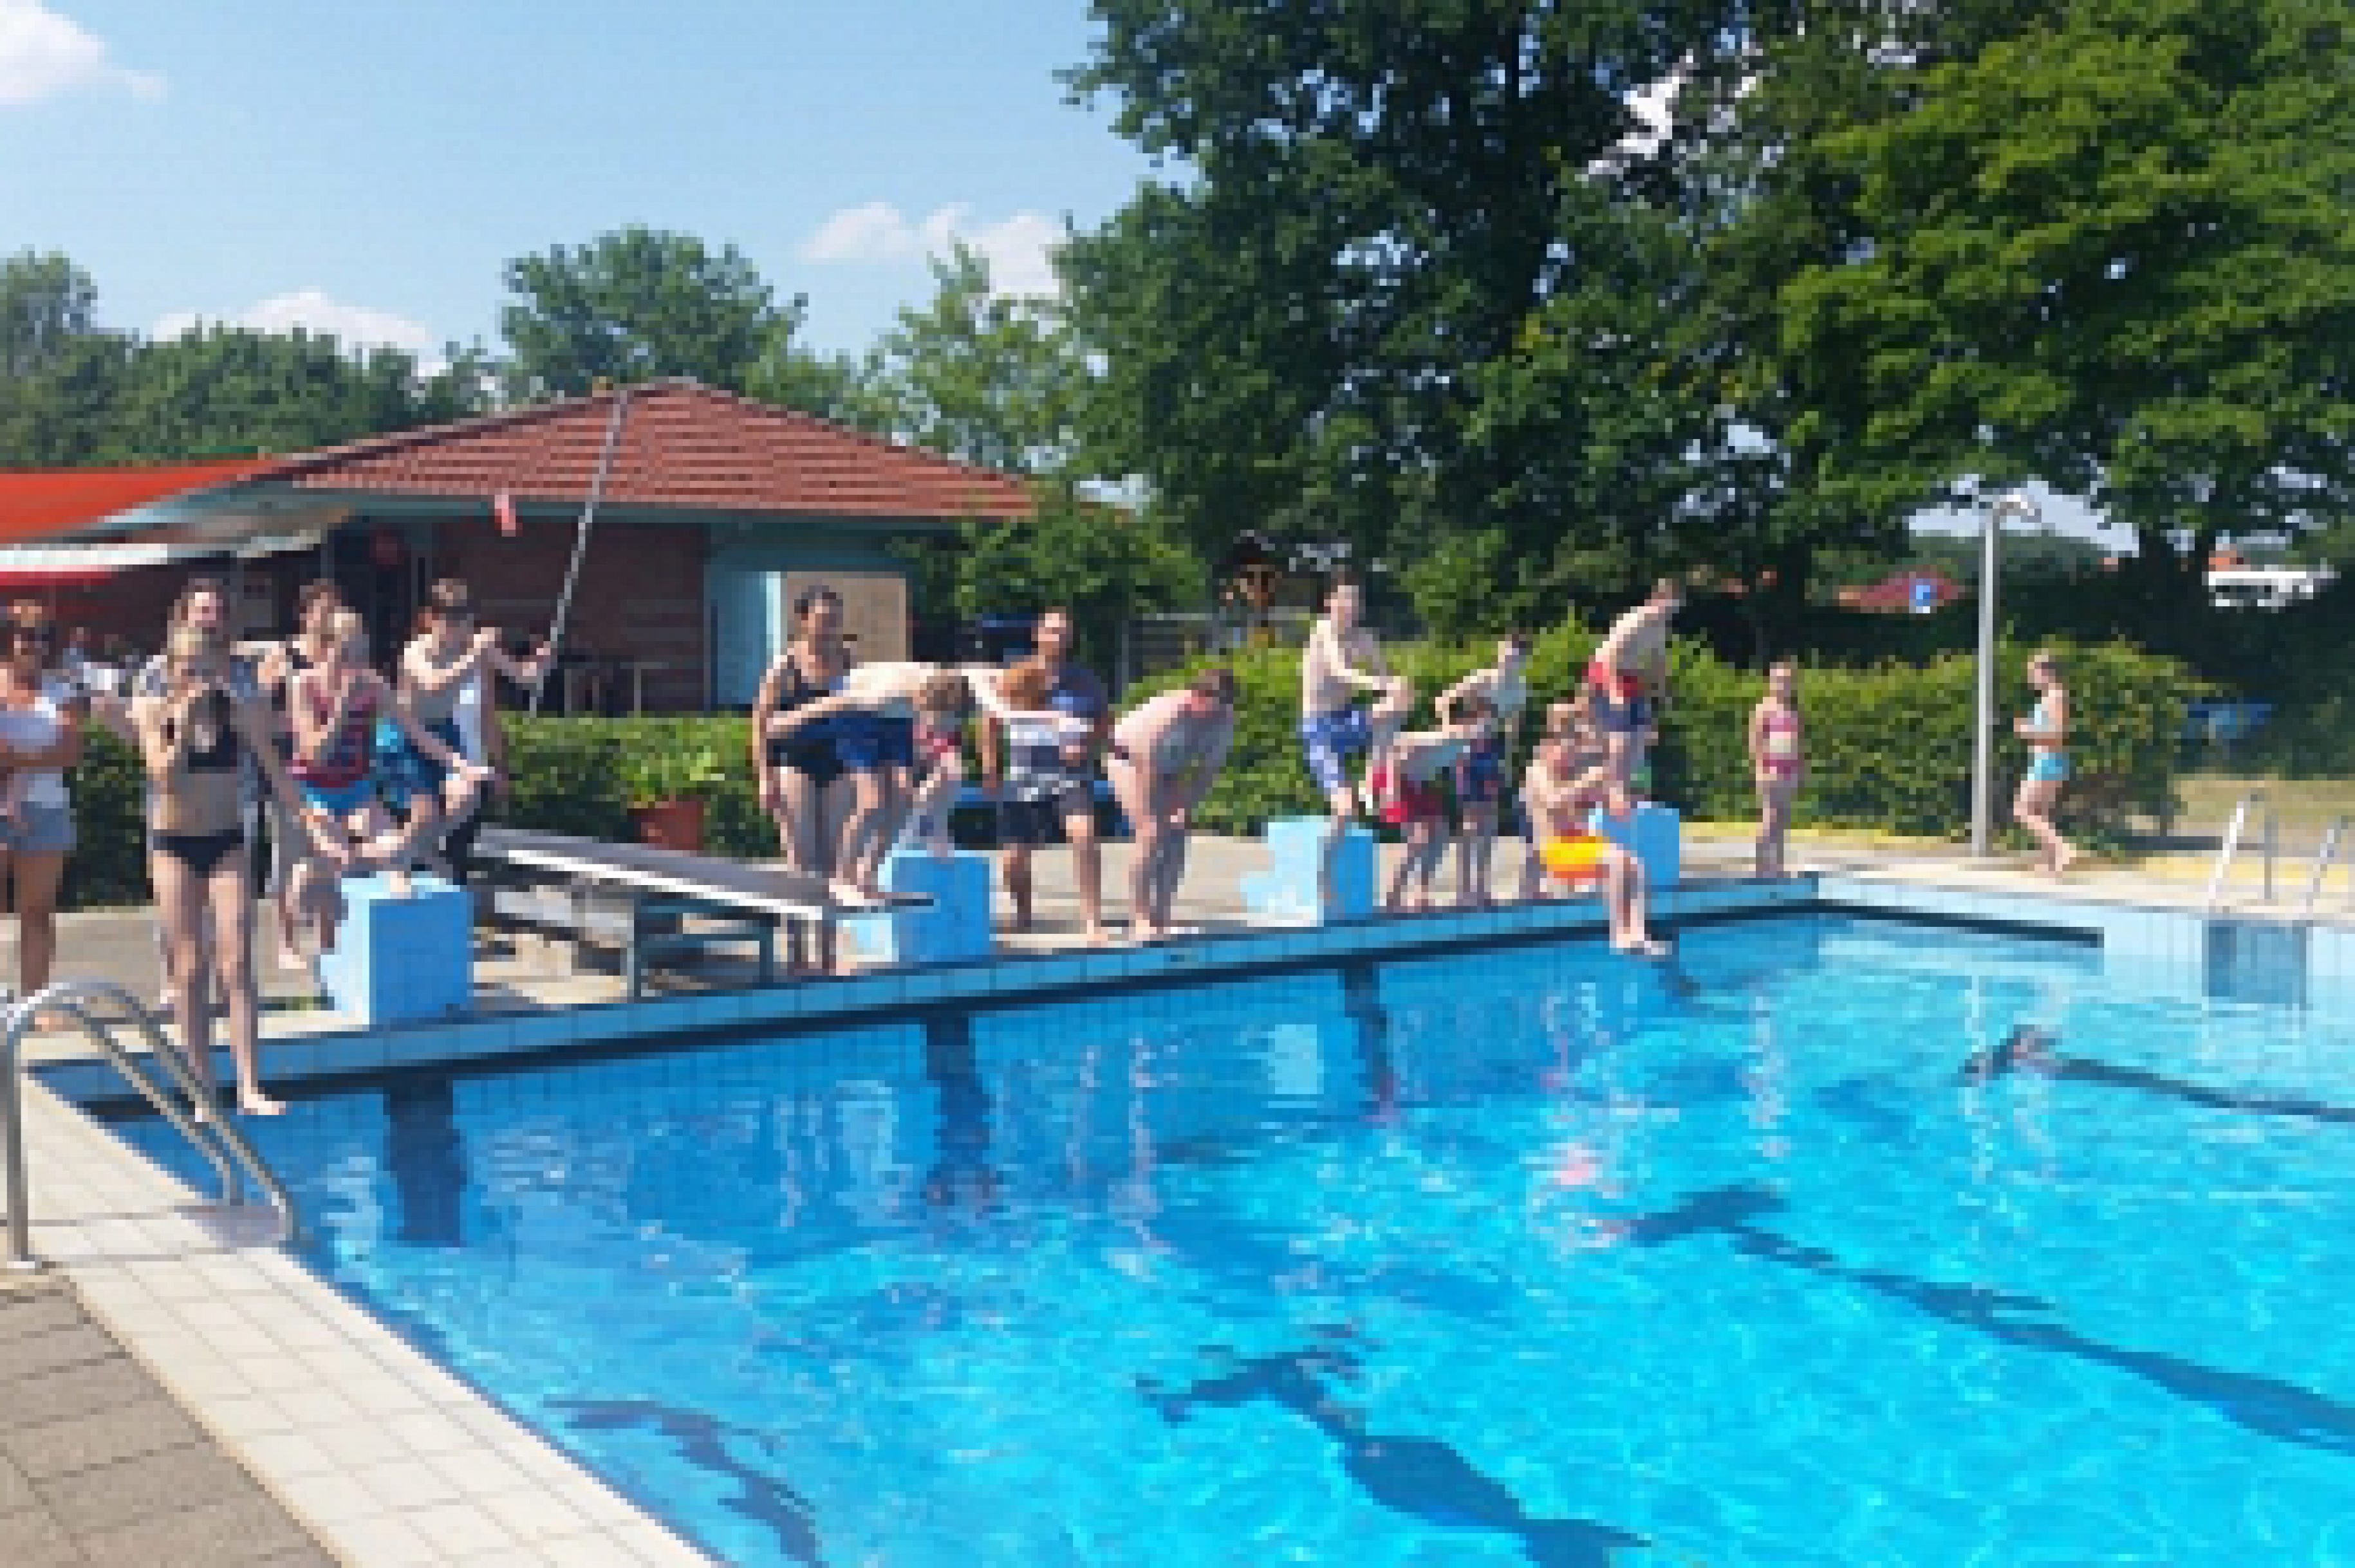 Sommercamp in Marklohe